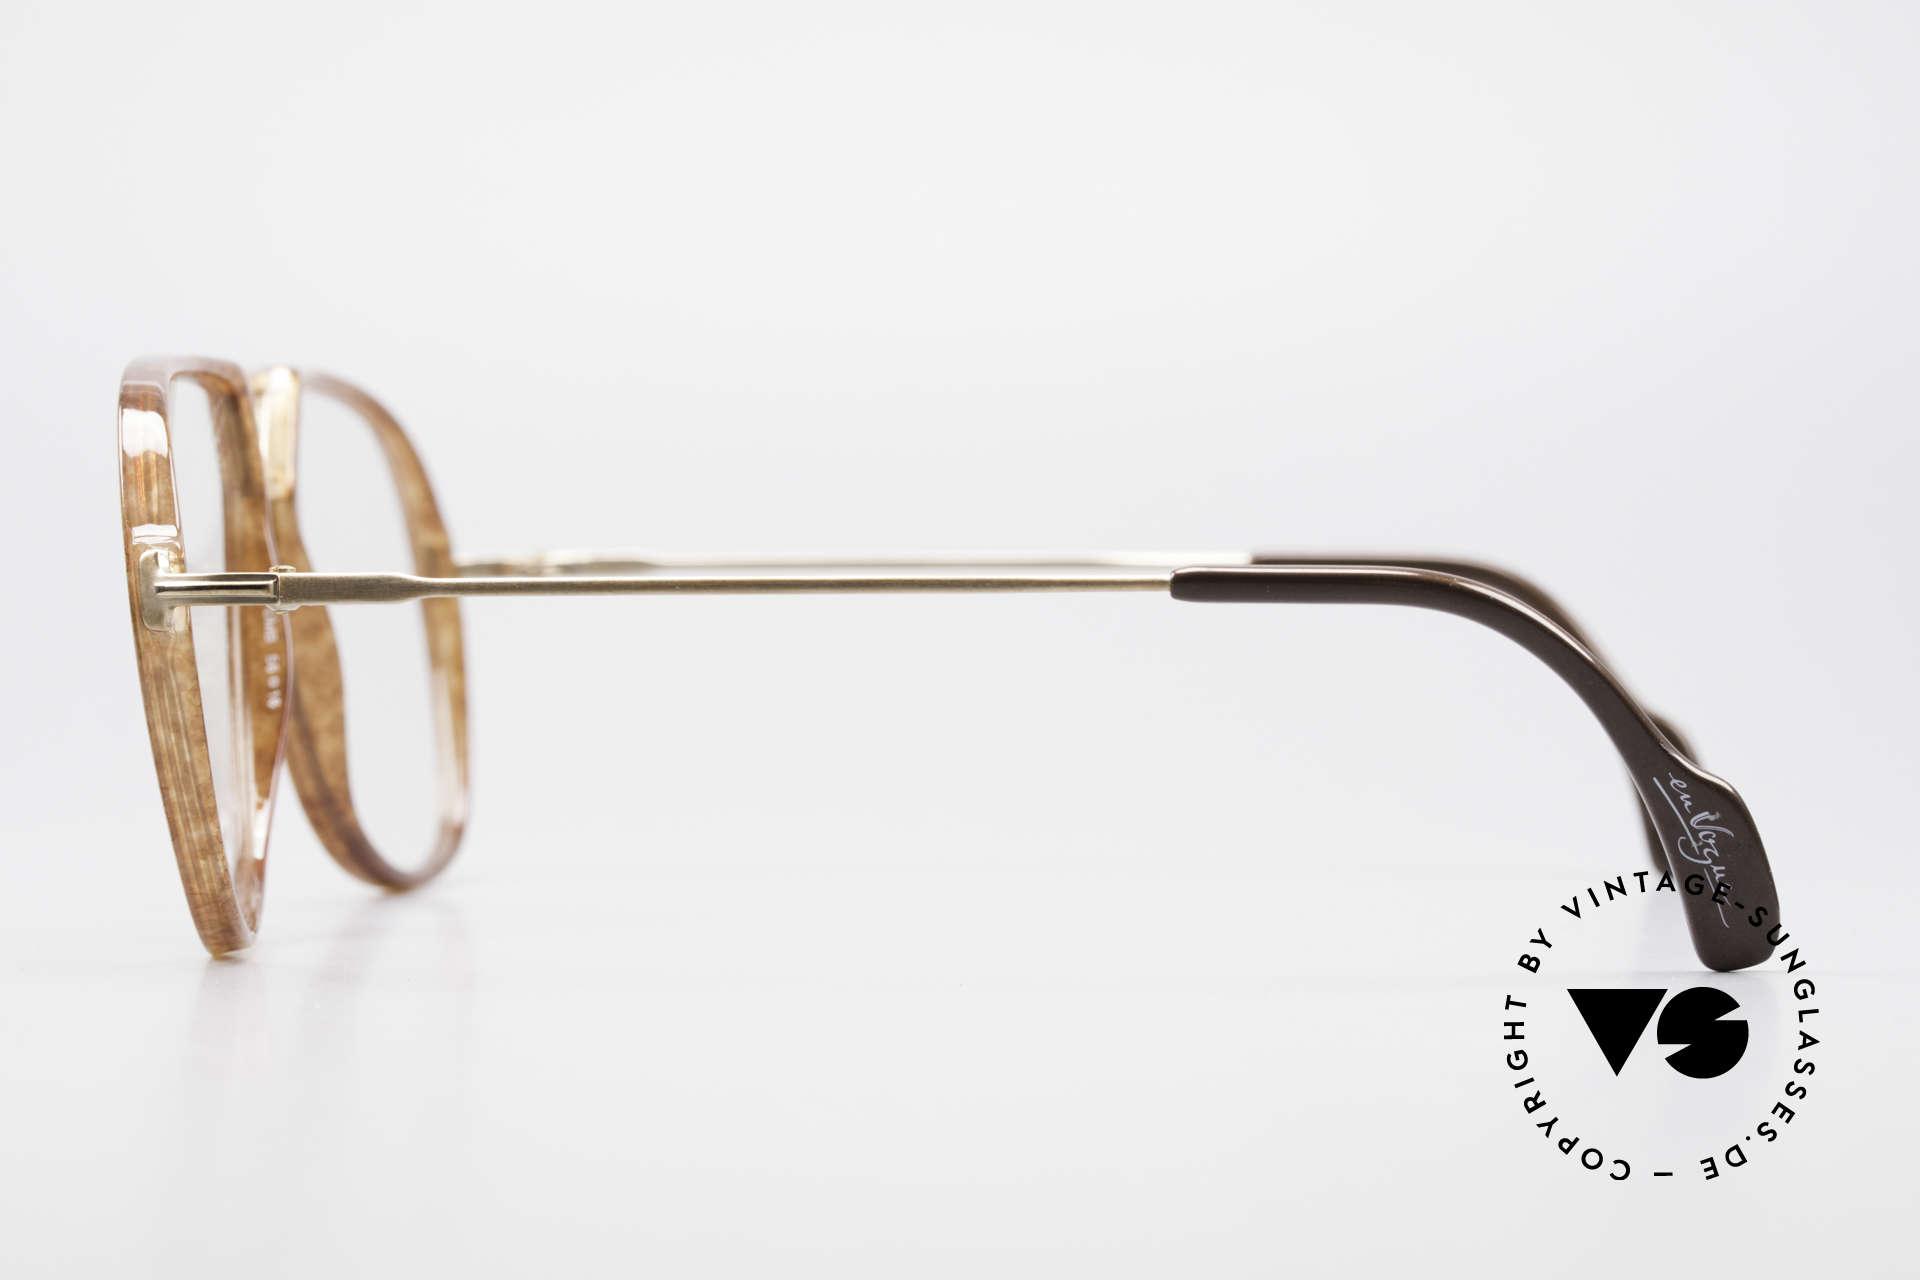 Metzler 0664 80's En Vogue Vintage Glasses, never worn, NOS (like all our classic men's eyewear), Made for Men